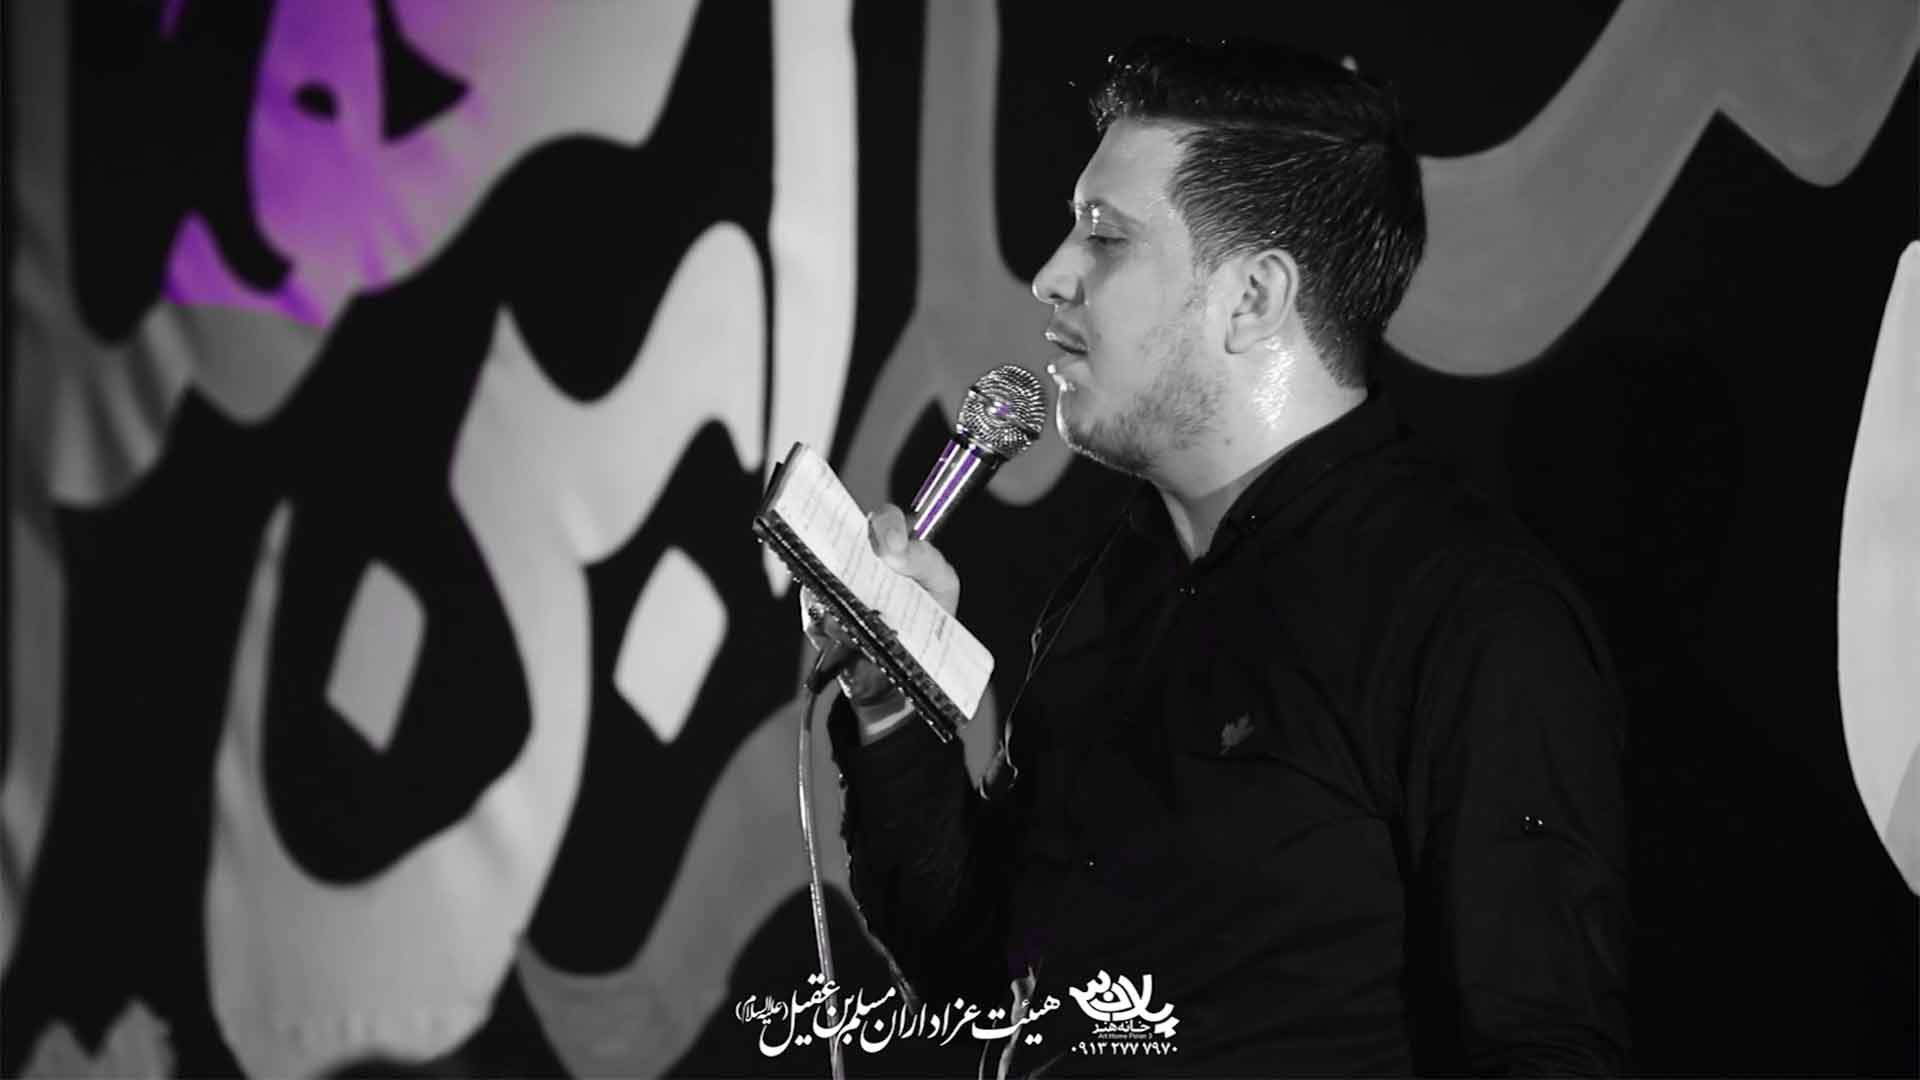 محشر شده به پا محمدرضا ناصری